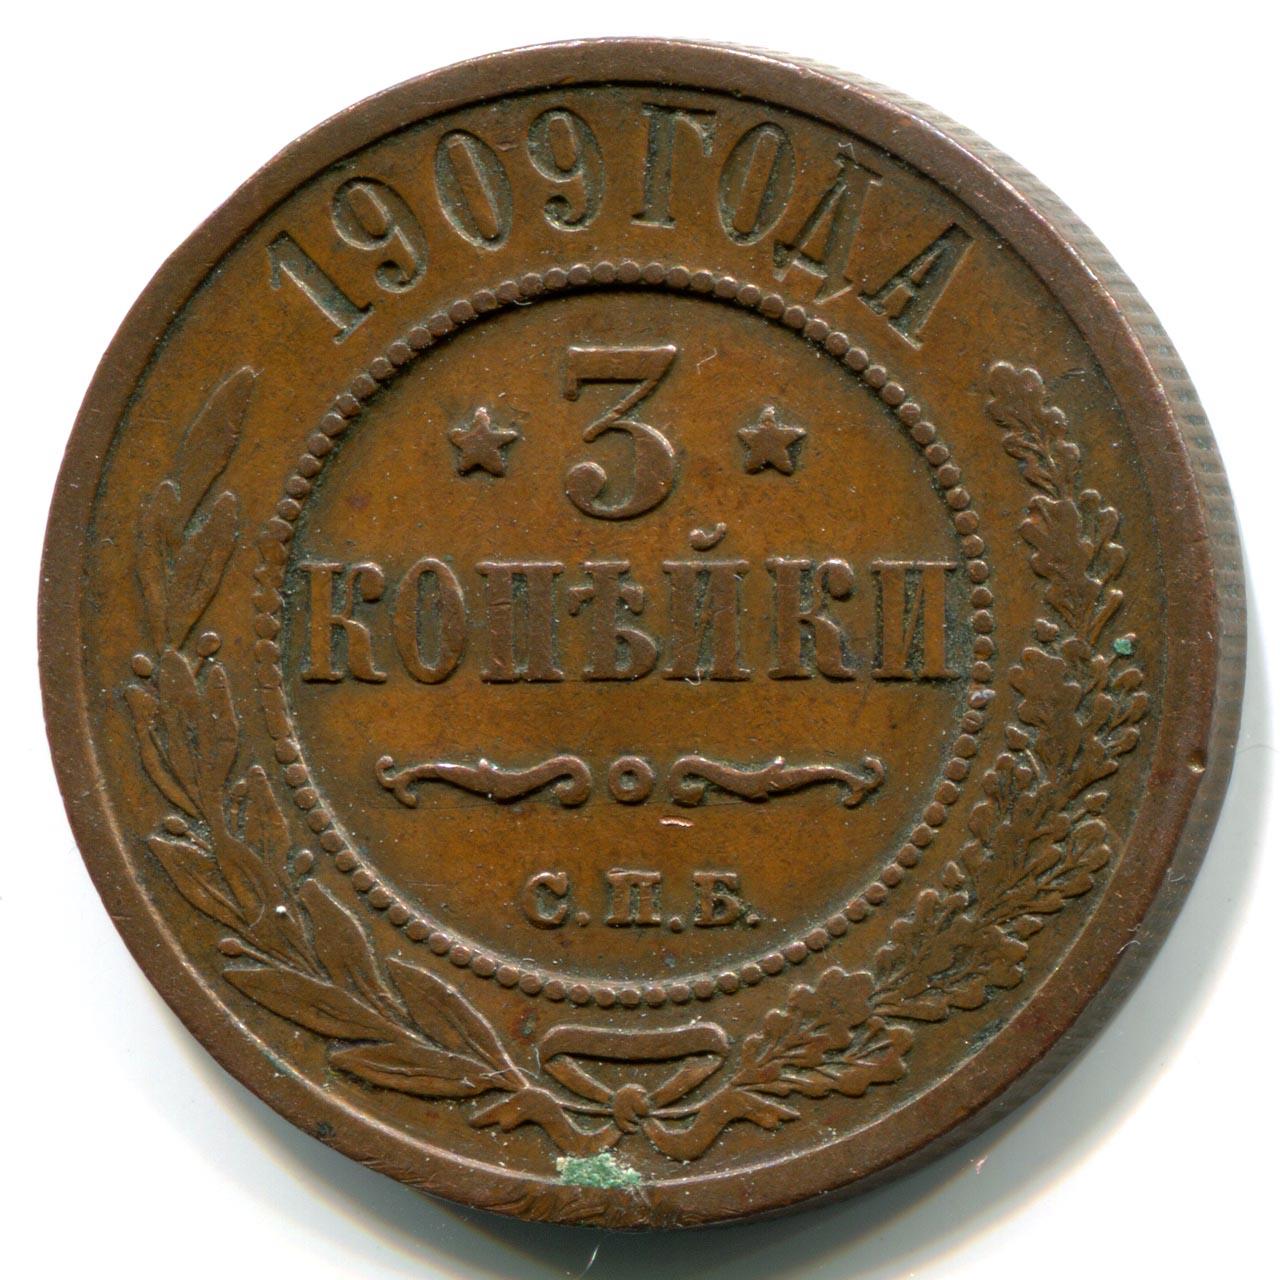 Монета 3 копейки 1909 года цена альбом для монет серия коллекционеръ